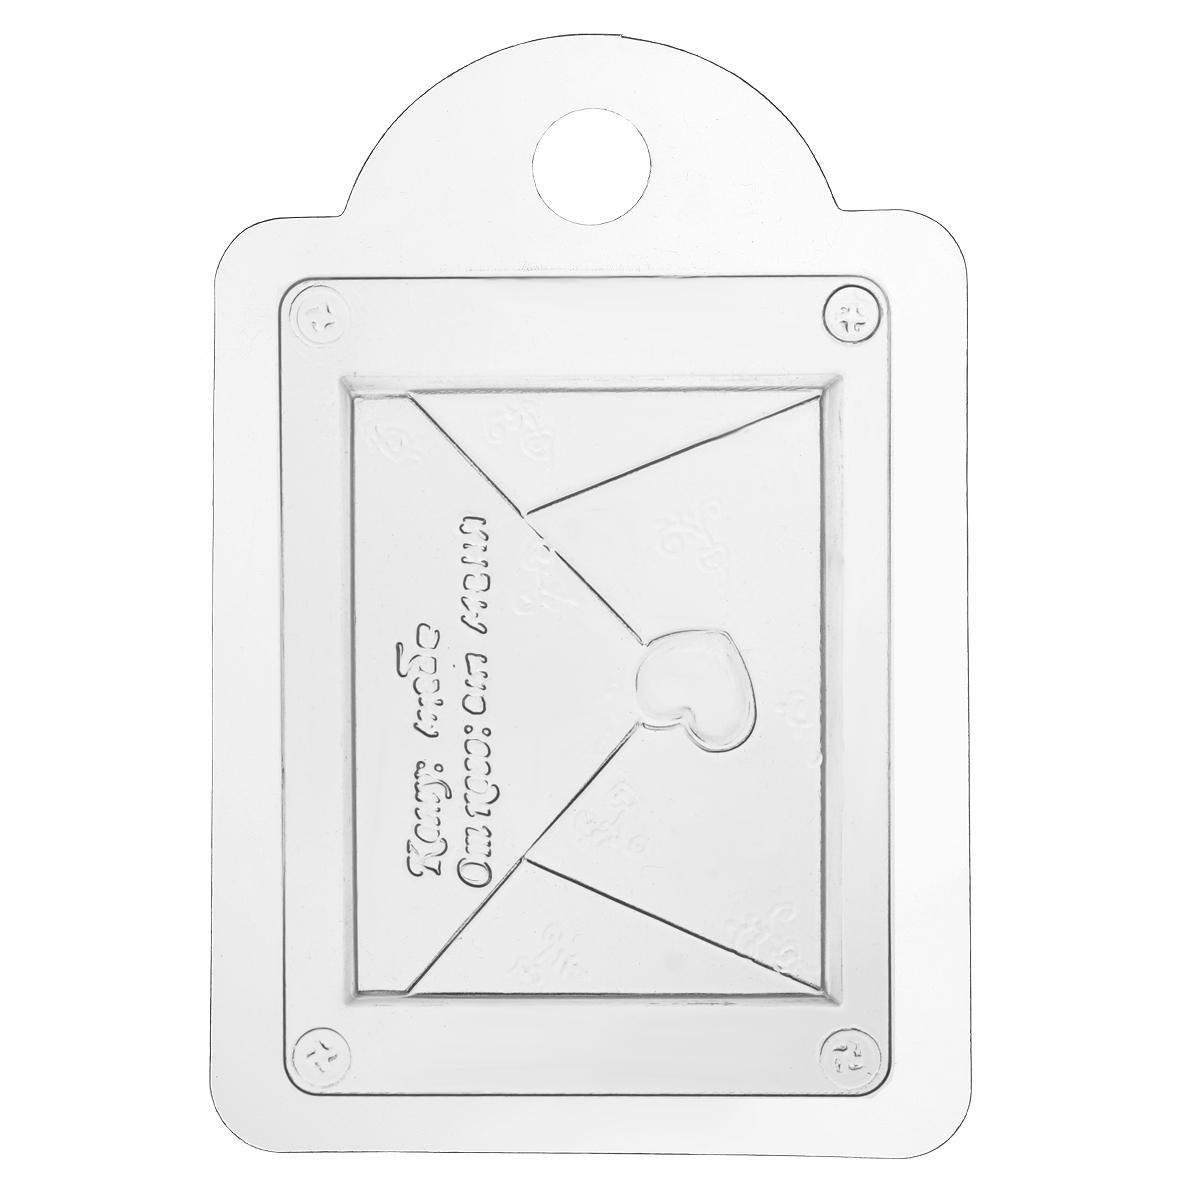 Форма для литья Любовное послание, пластиковая, 16 х 11 х 2,5 см форма для литья танк пластиковая 16 х 11 х 2 5 см